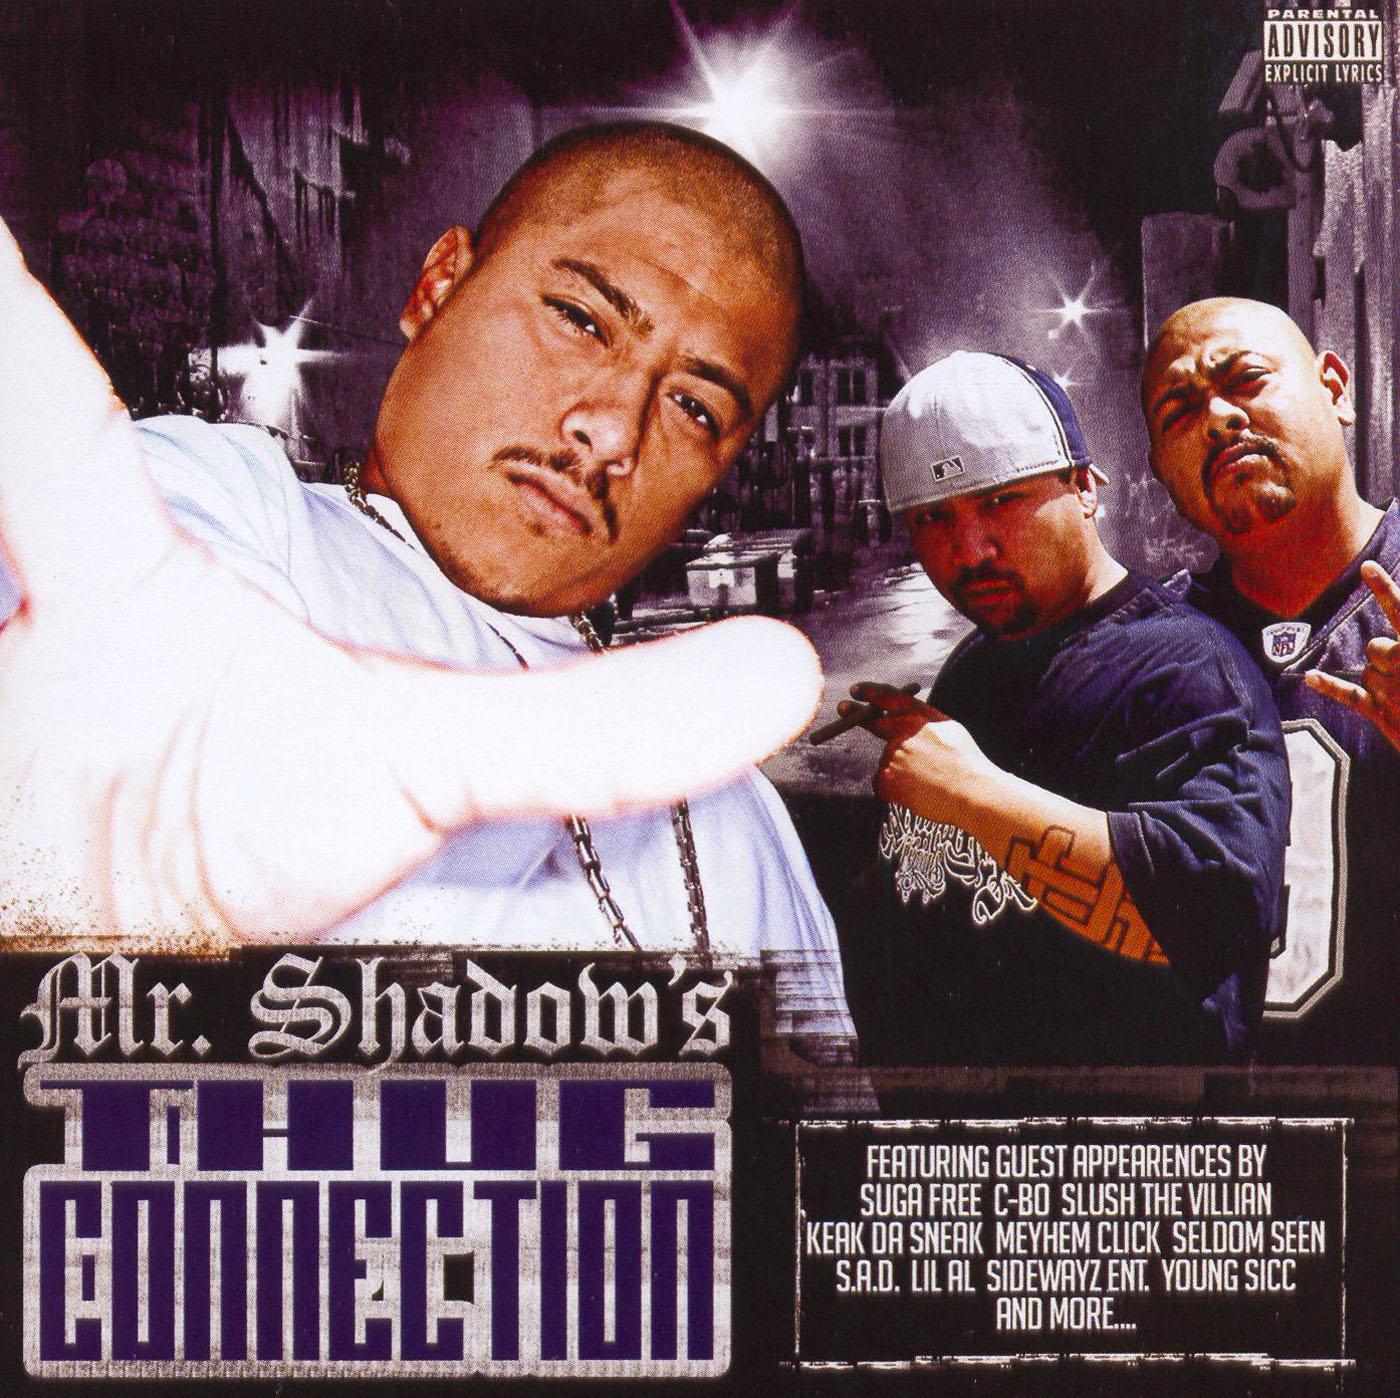 Mr. Shadow: Thug Connection